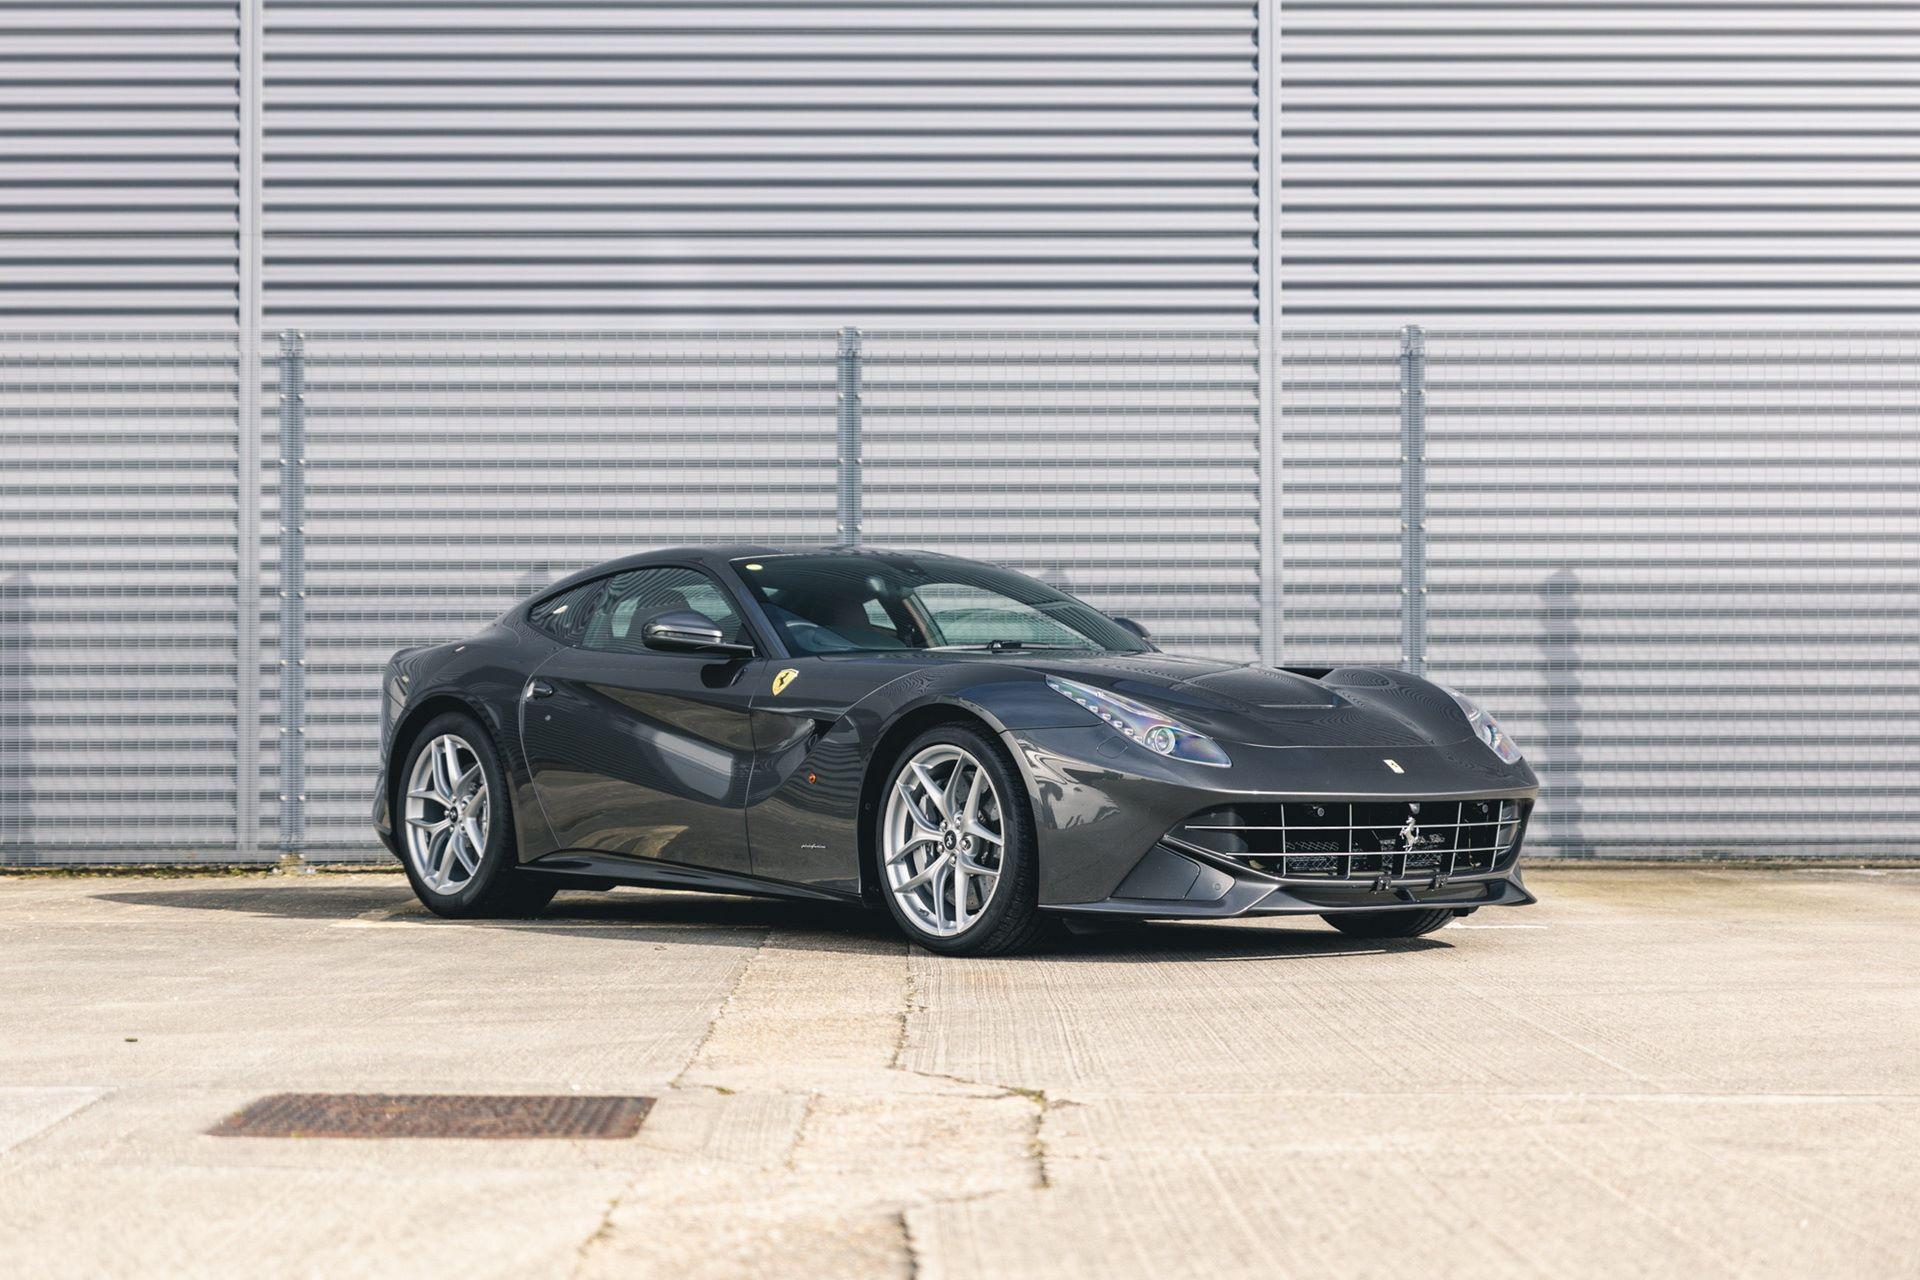 Ferrari-F12berlinetta-Chris-Harris-1